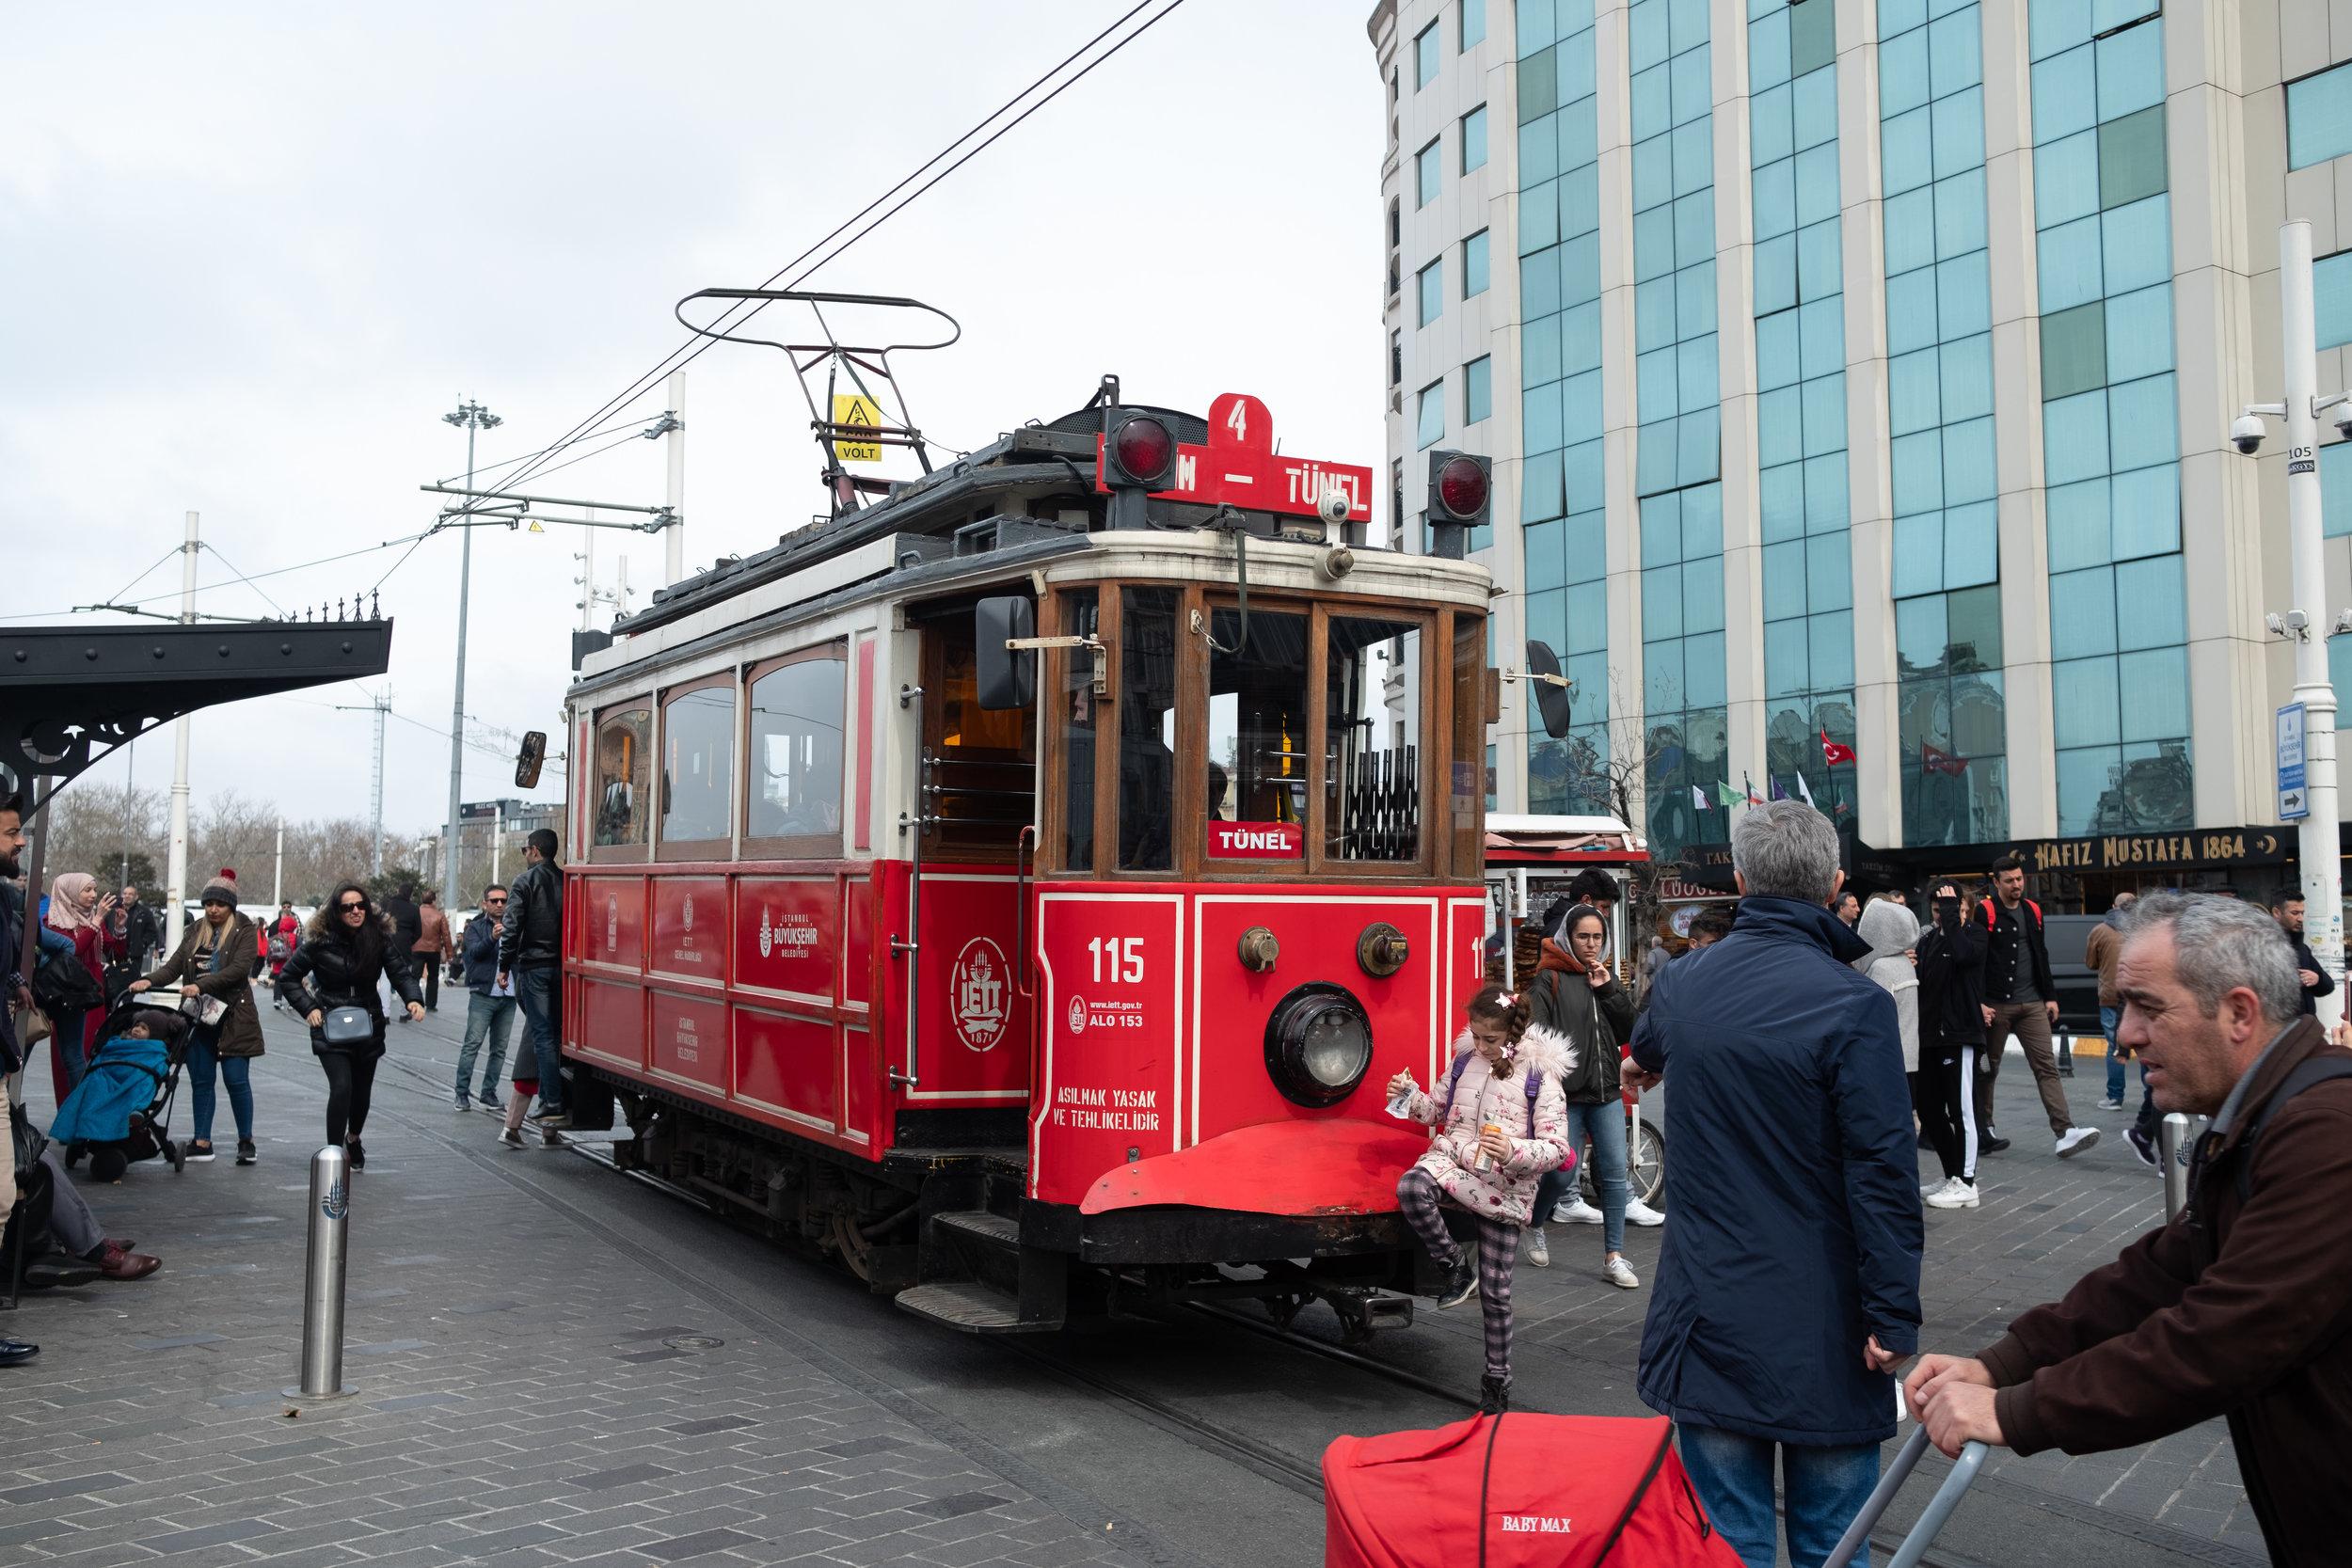 20190406 - Turkey - 0747.JPG